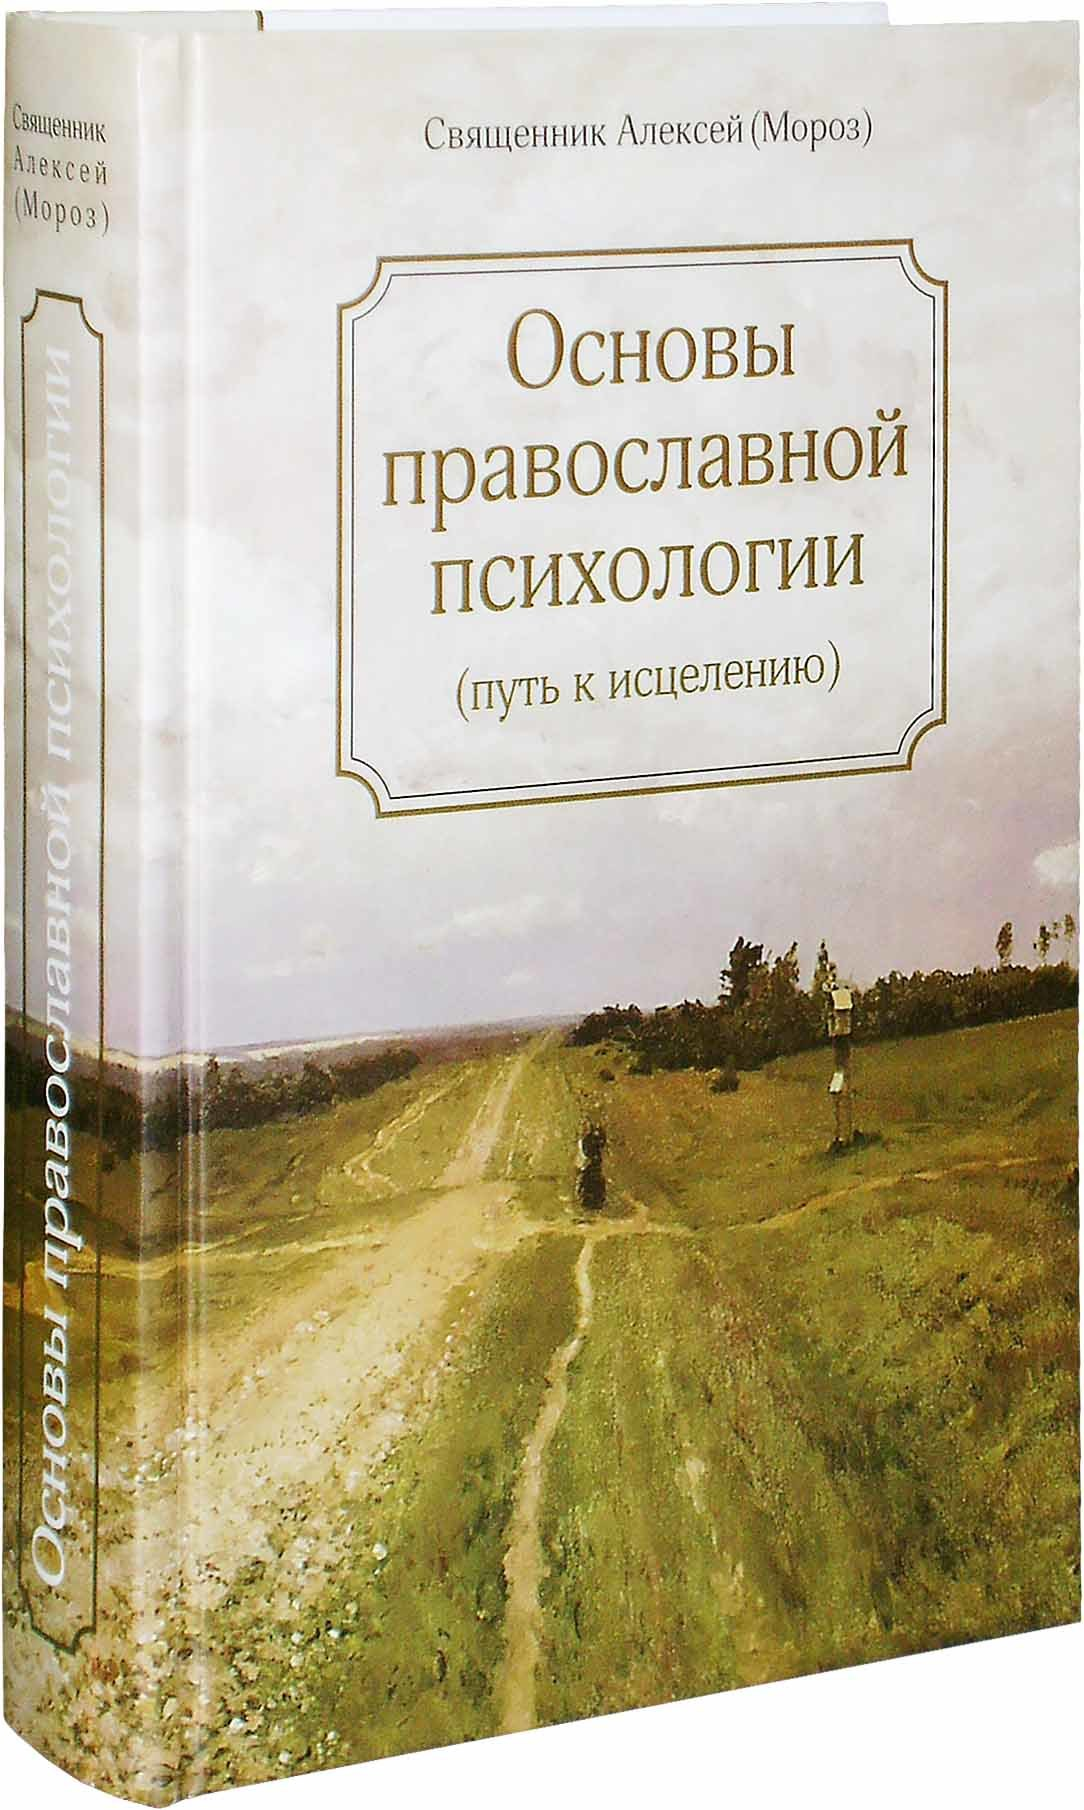 Савва тимофеевич морозов в орехово-зуево